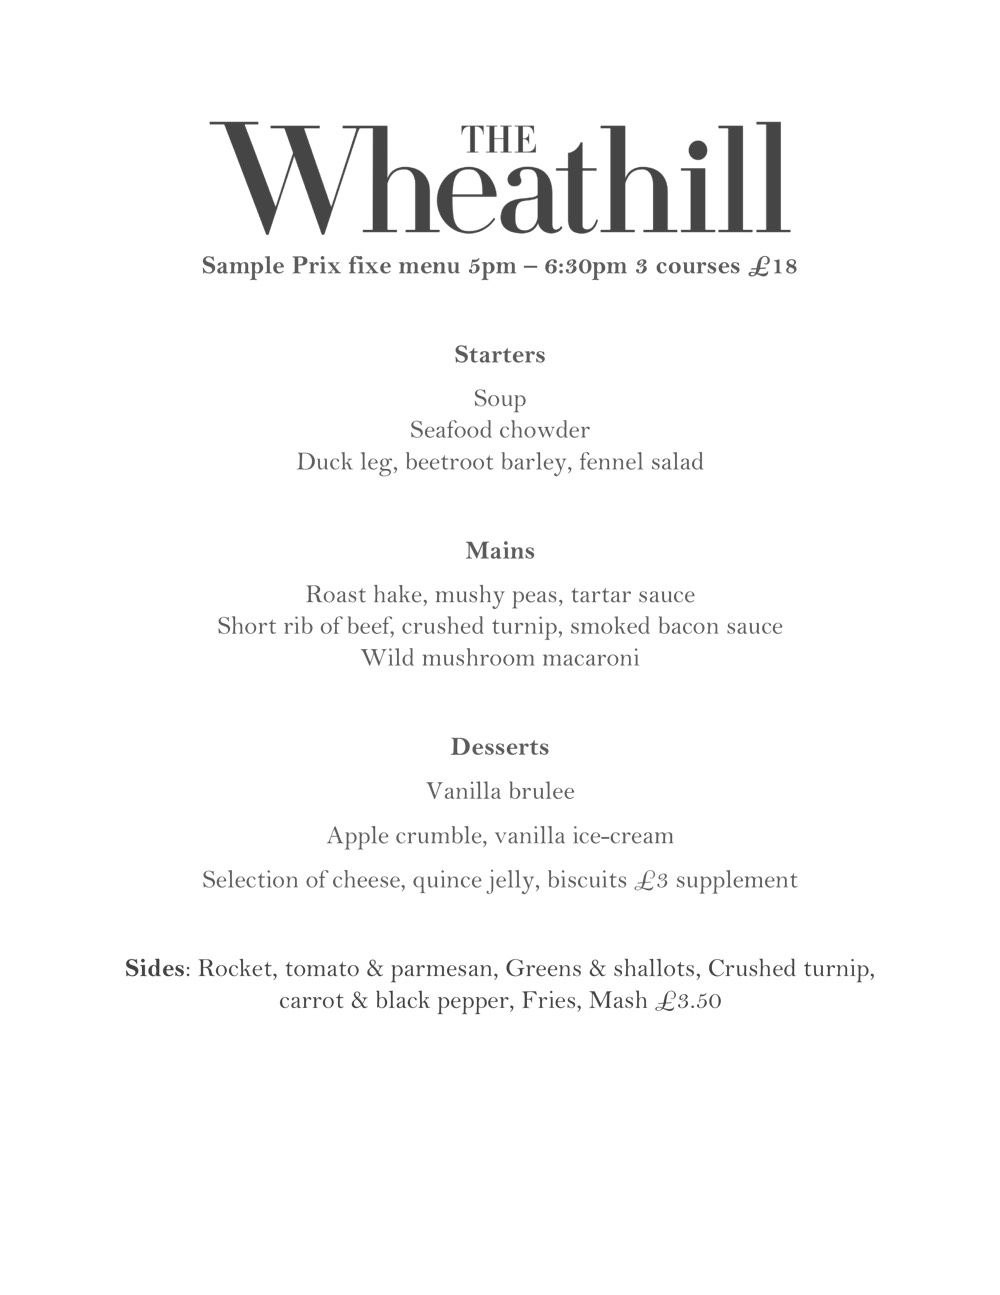 Prix Fixe Menu  The Wheathill Restaurant  Restaurant Menu Formats In Prix Fixe Menu Template